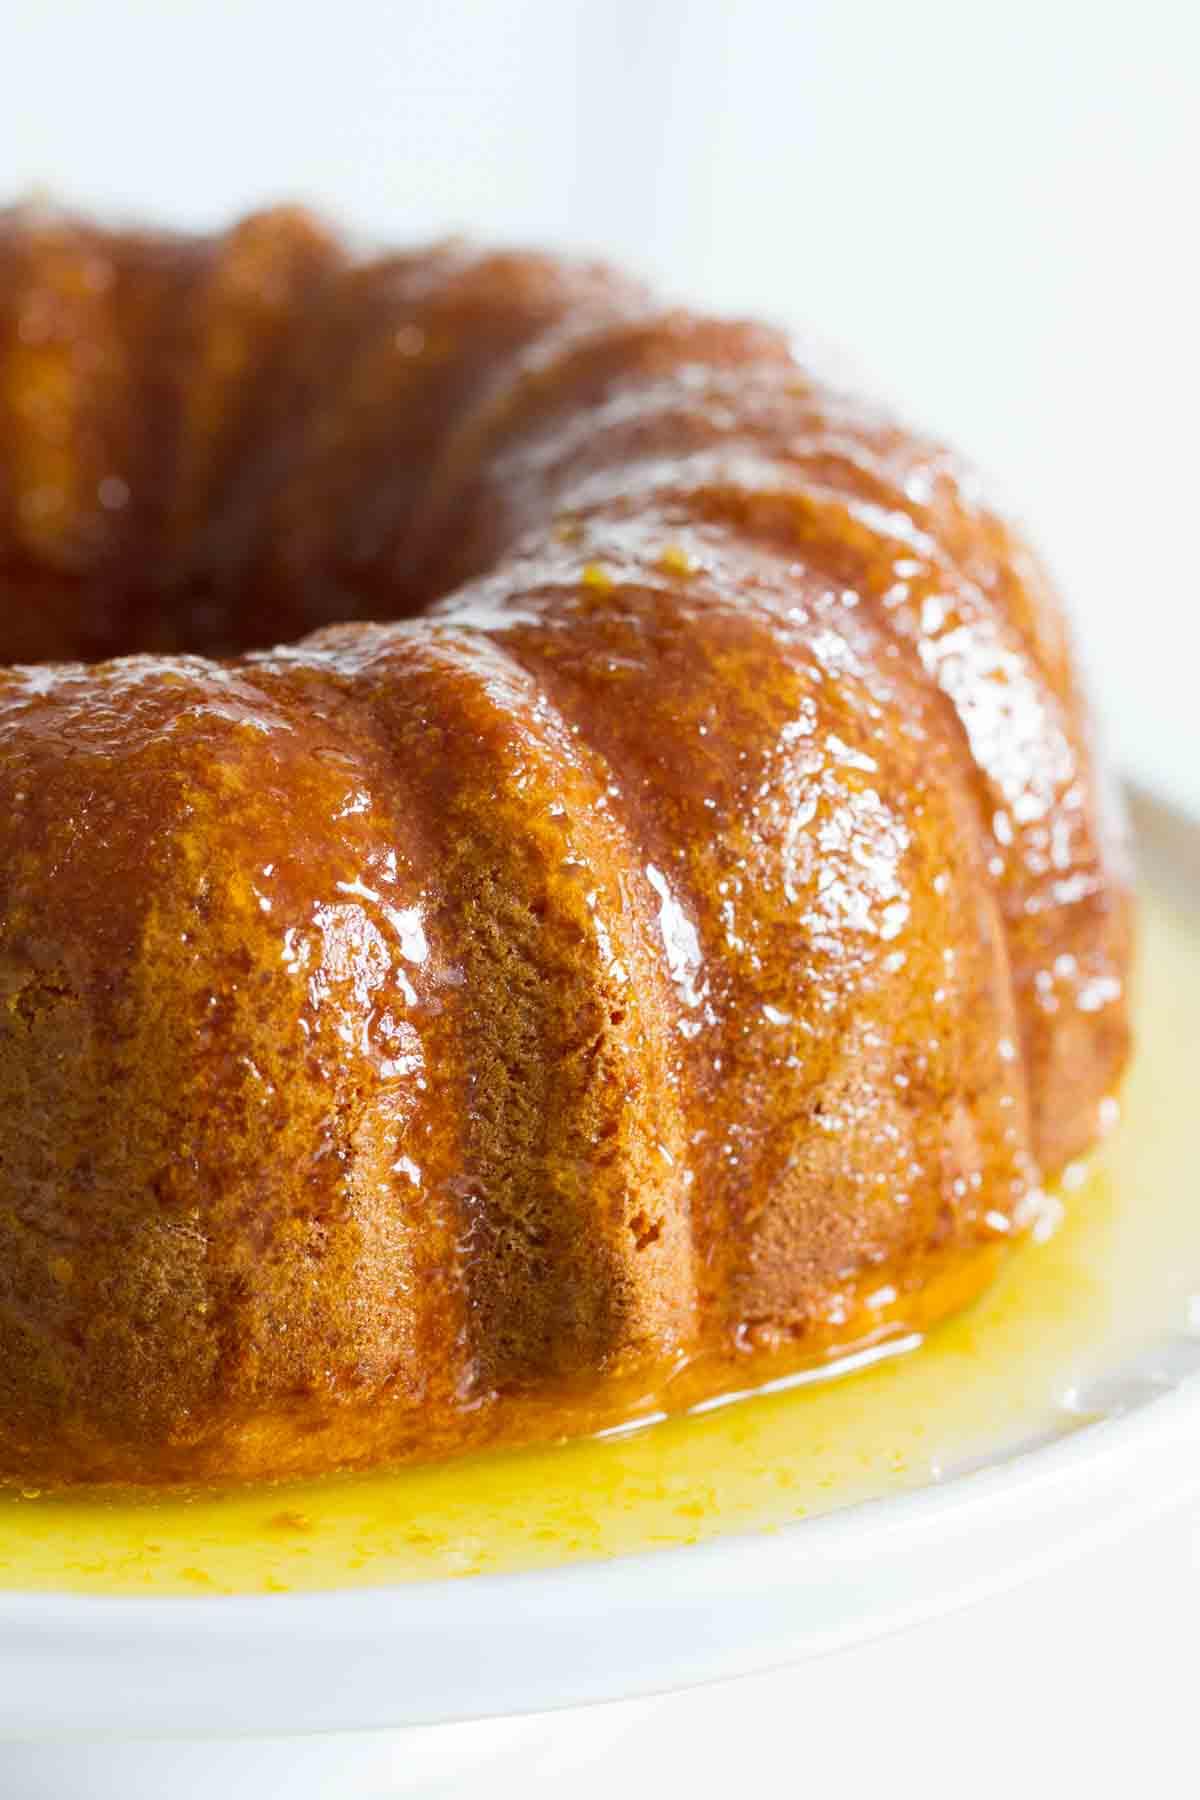 orange bundt cake with orange glaze on a platter